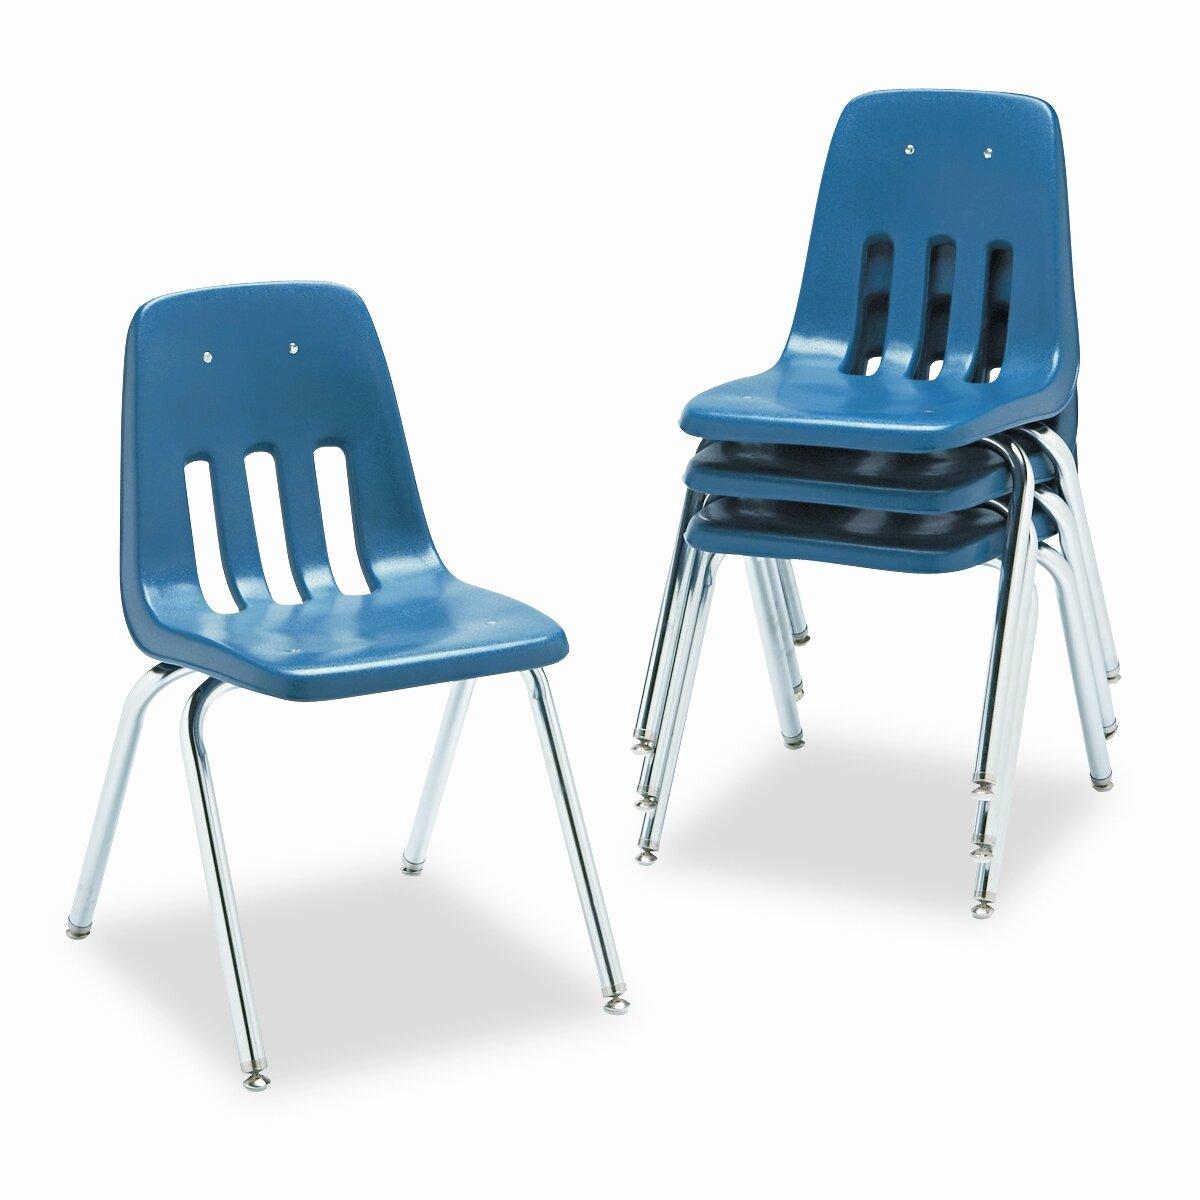 Virco 9000 Series Plastic Classroom Chair Reviews Wayfair